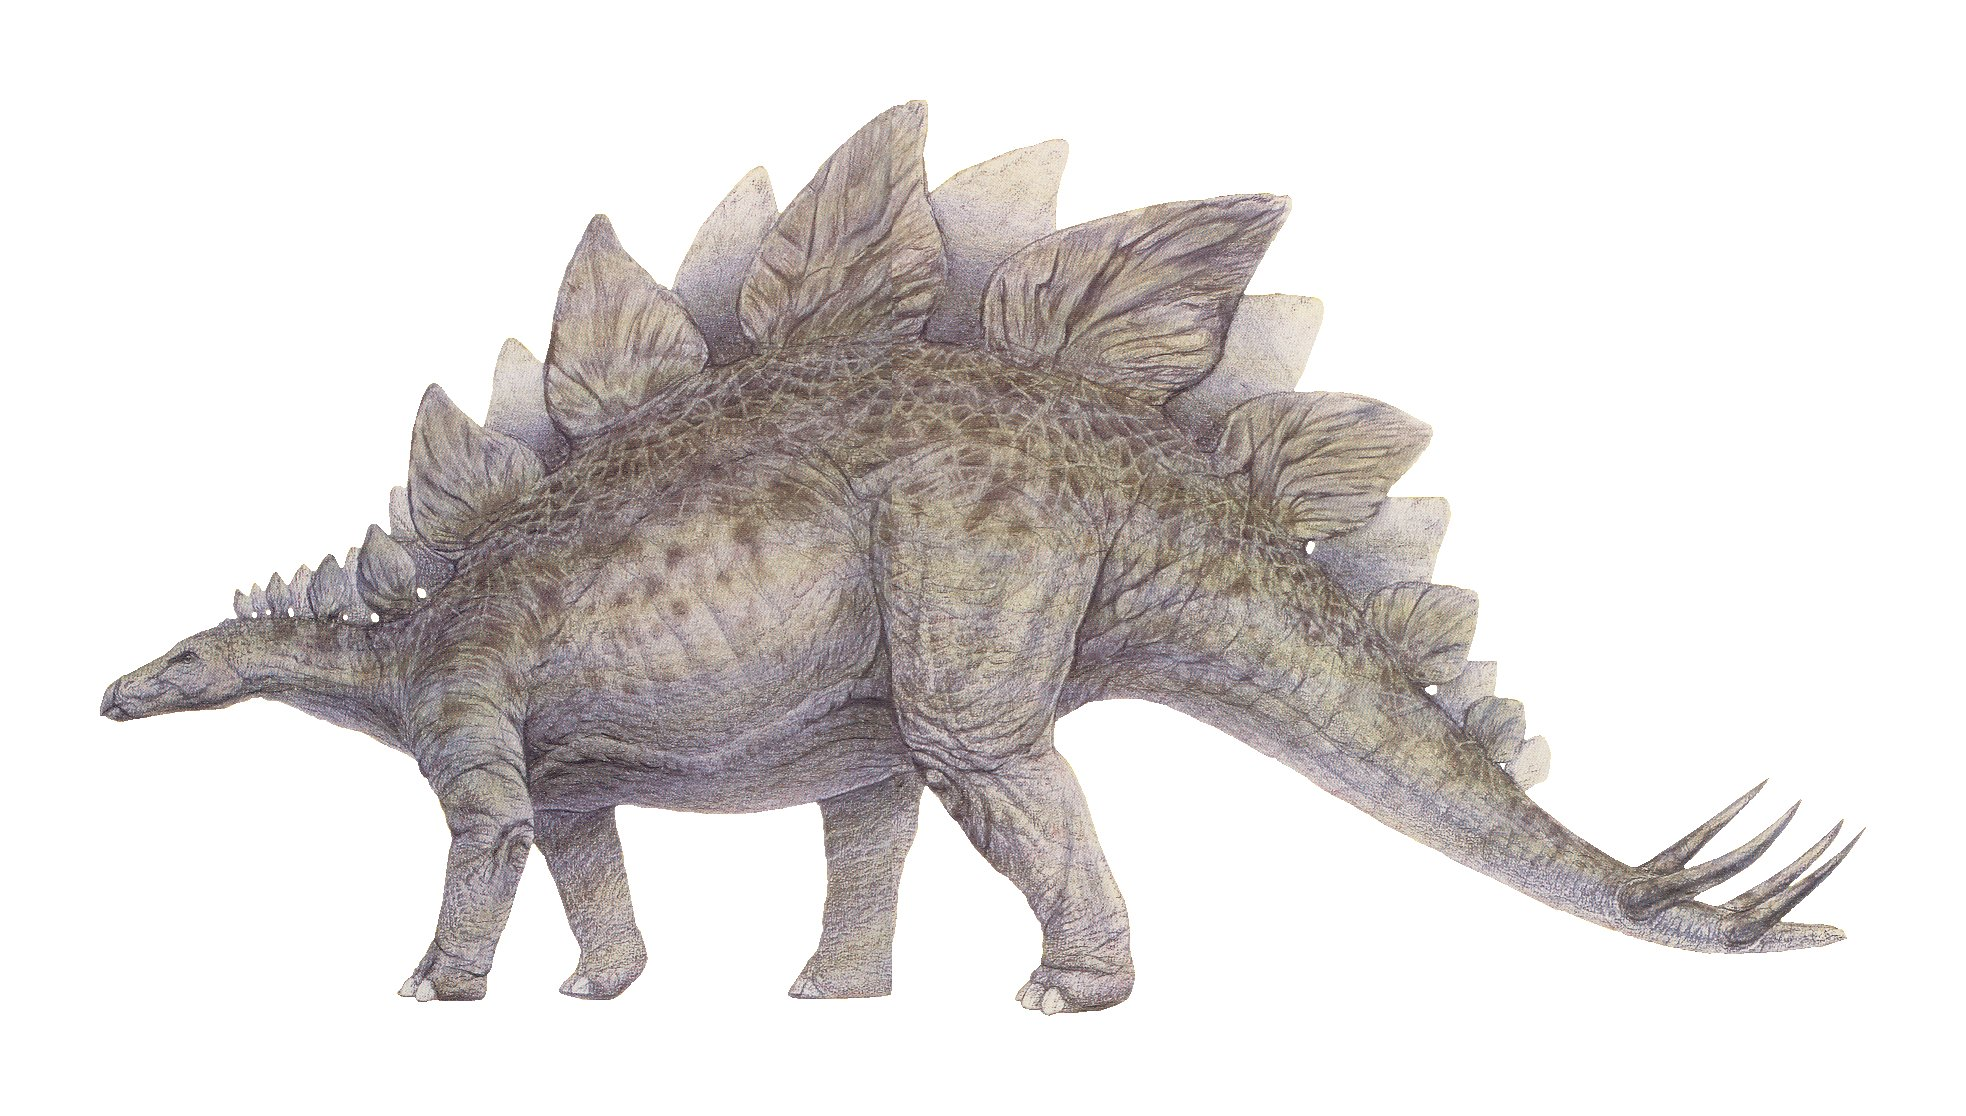 8. Estegosaurio